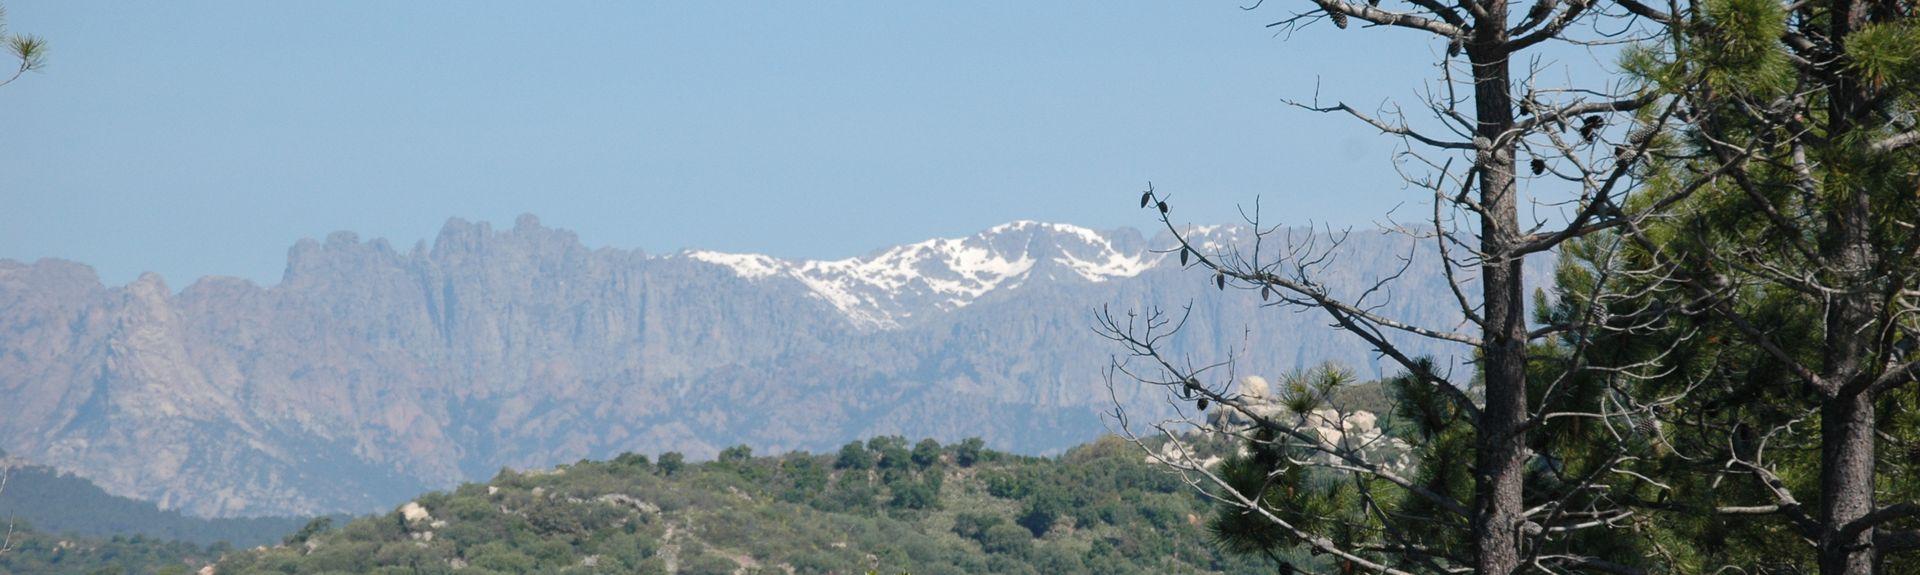 Gialla, San-Gavino-di-Carbini, Corsica, France